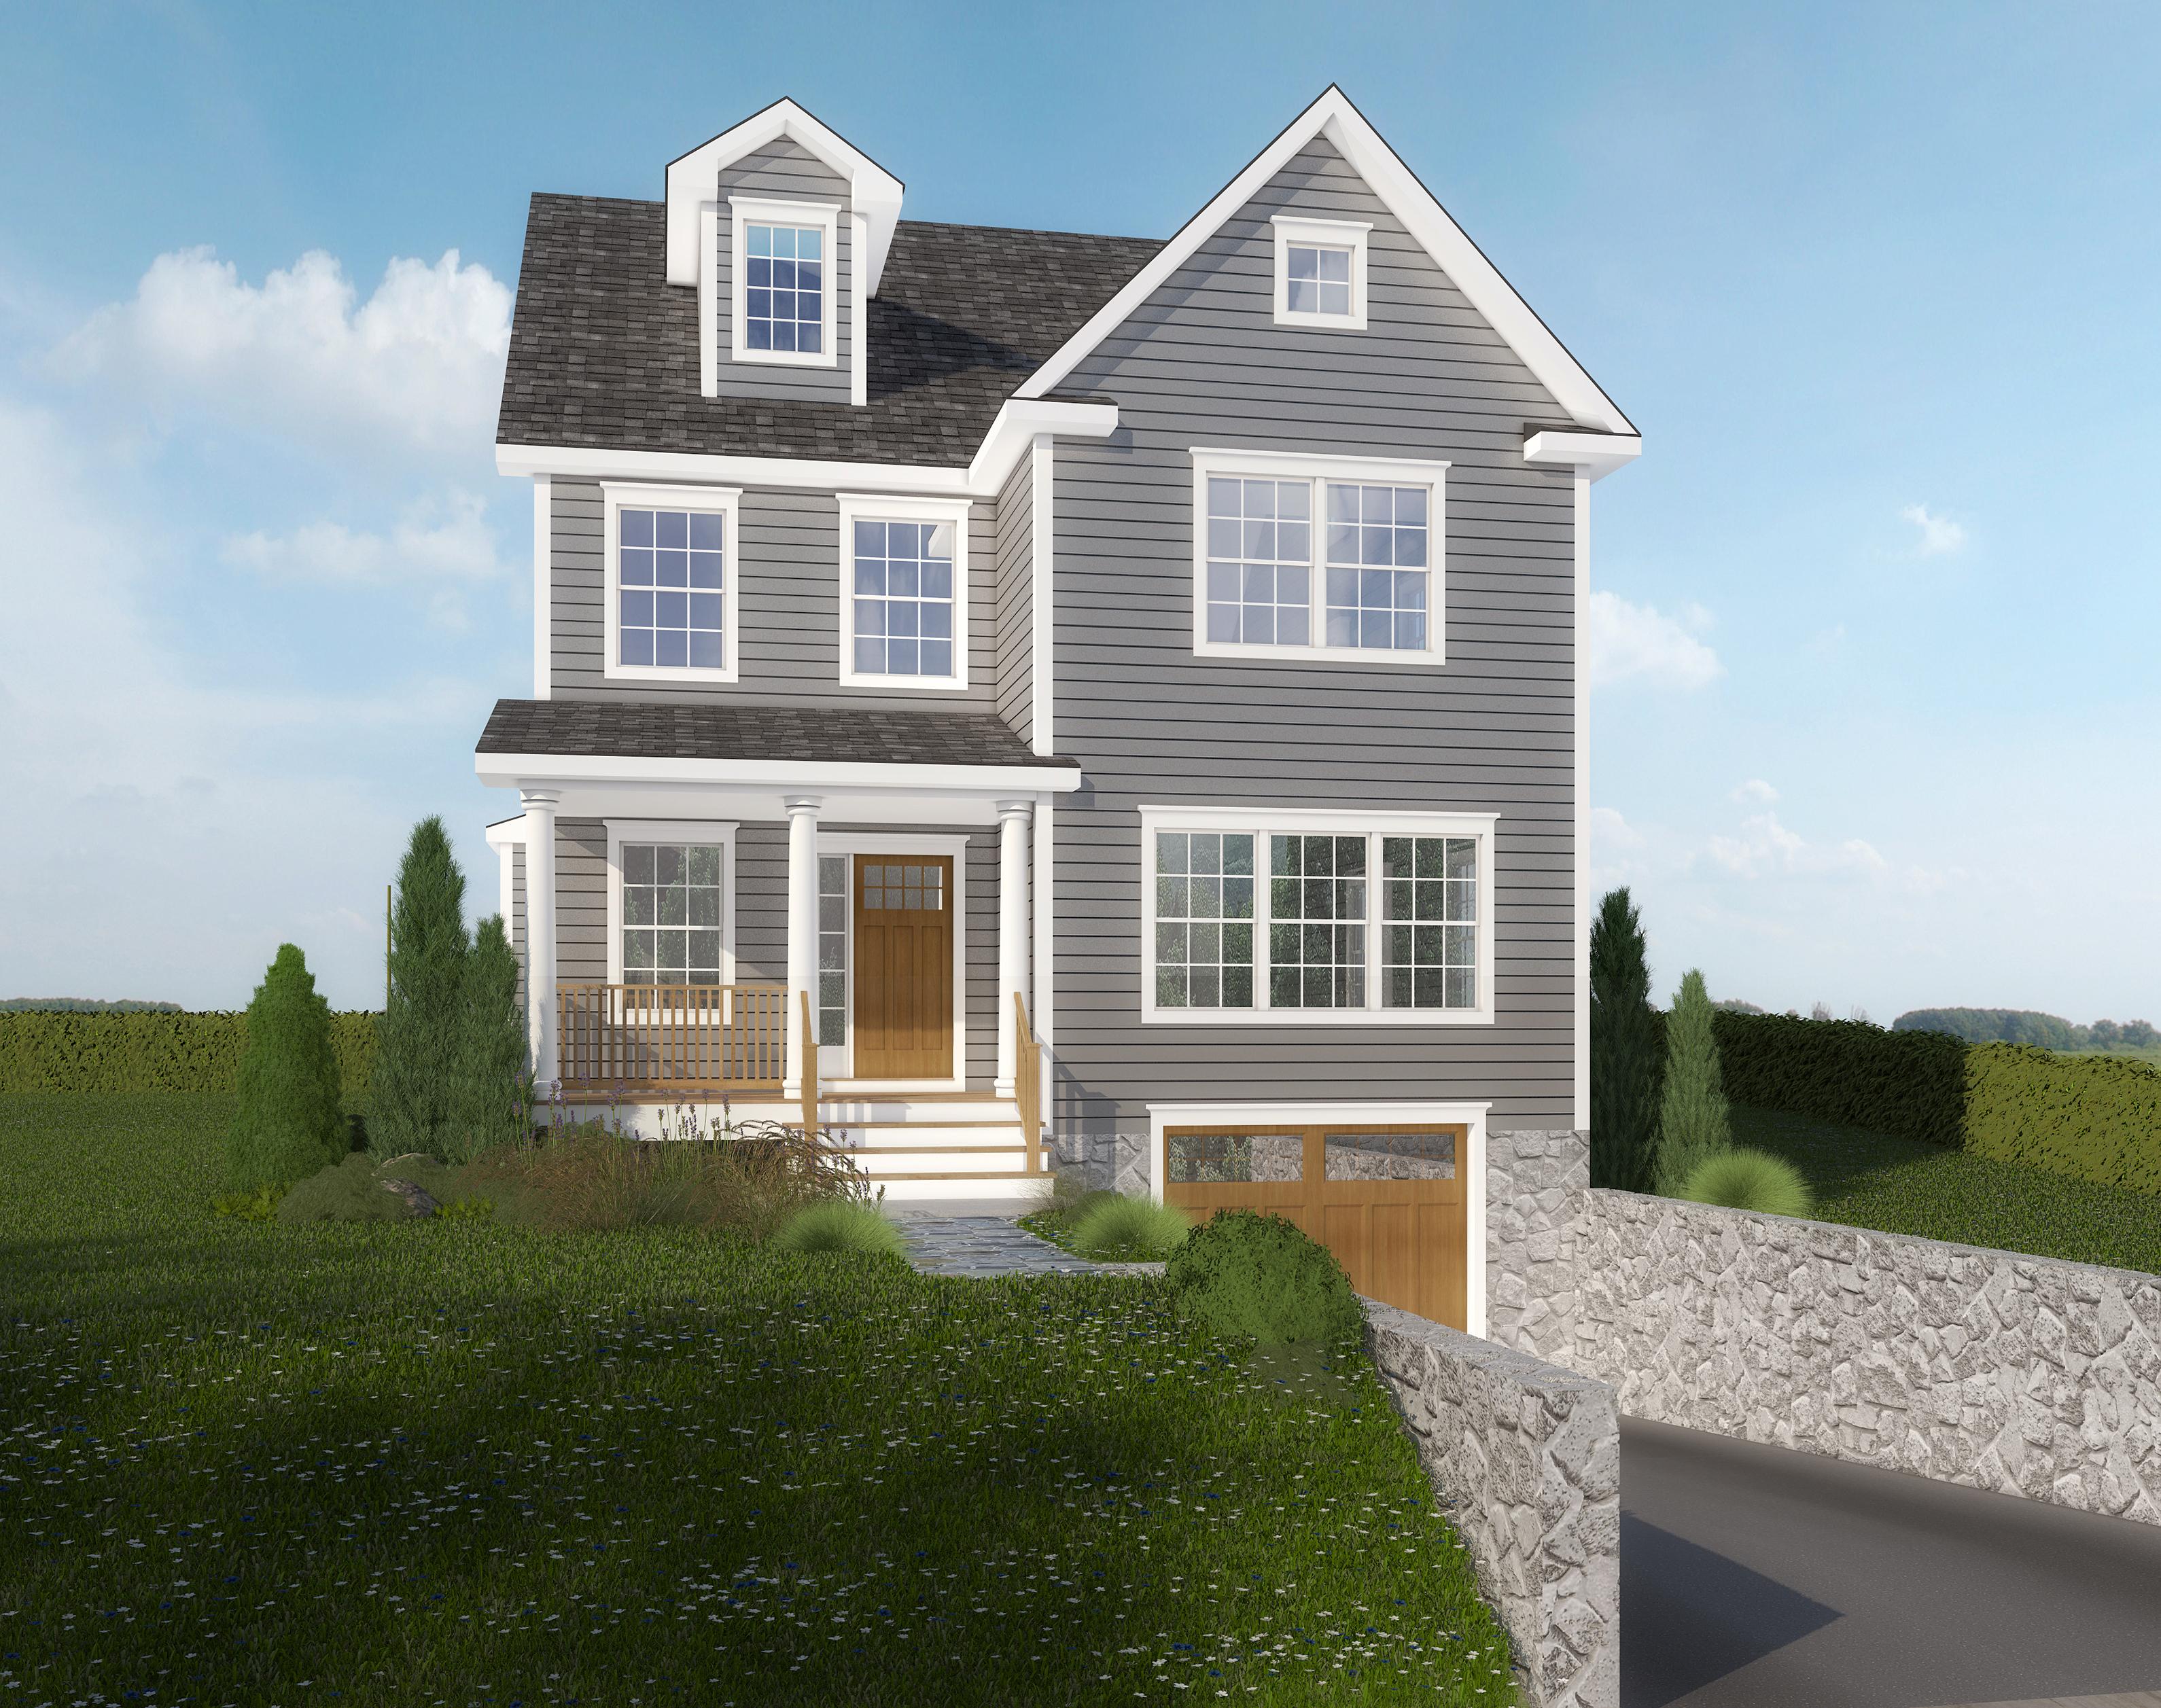 Property For Sale at 43 Sanford Street